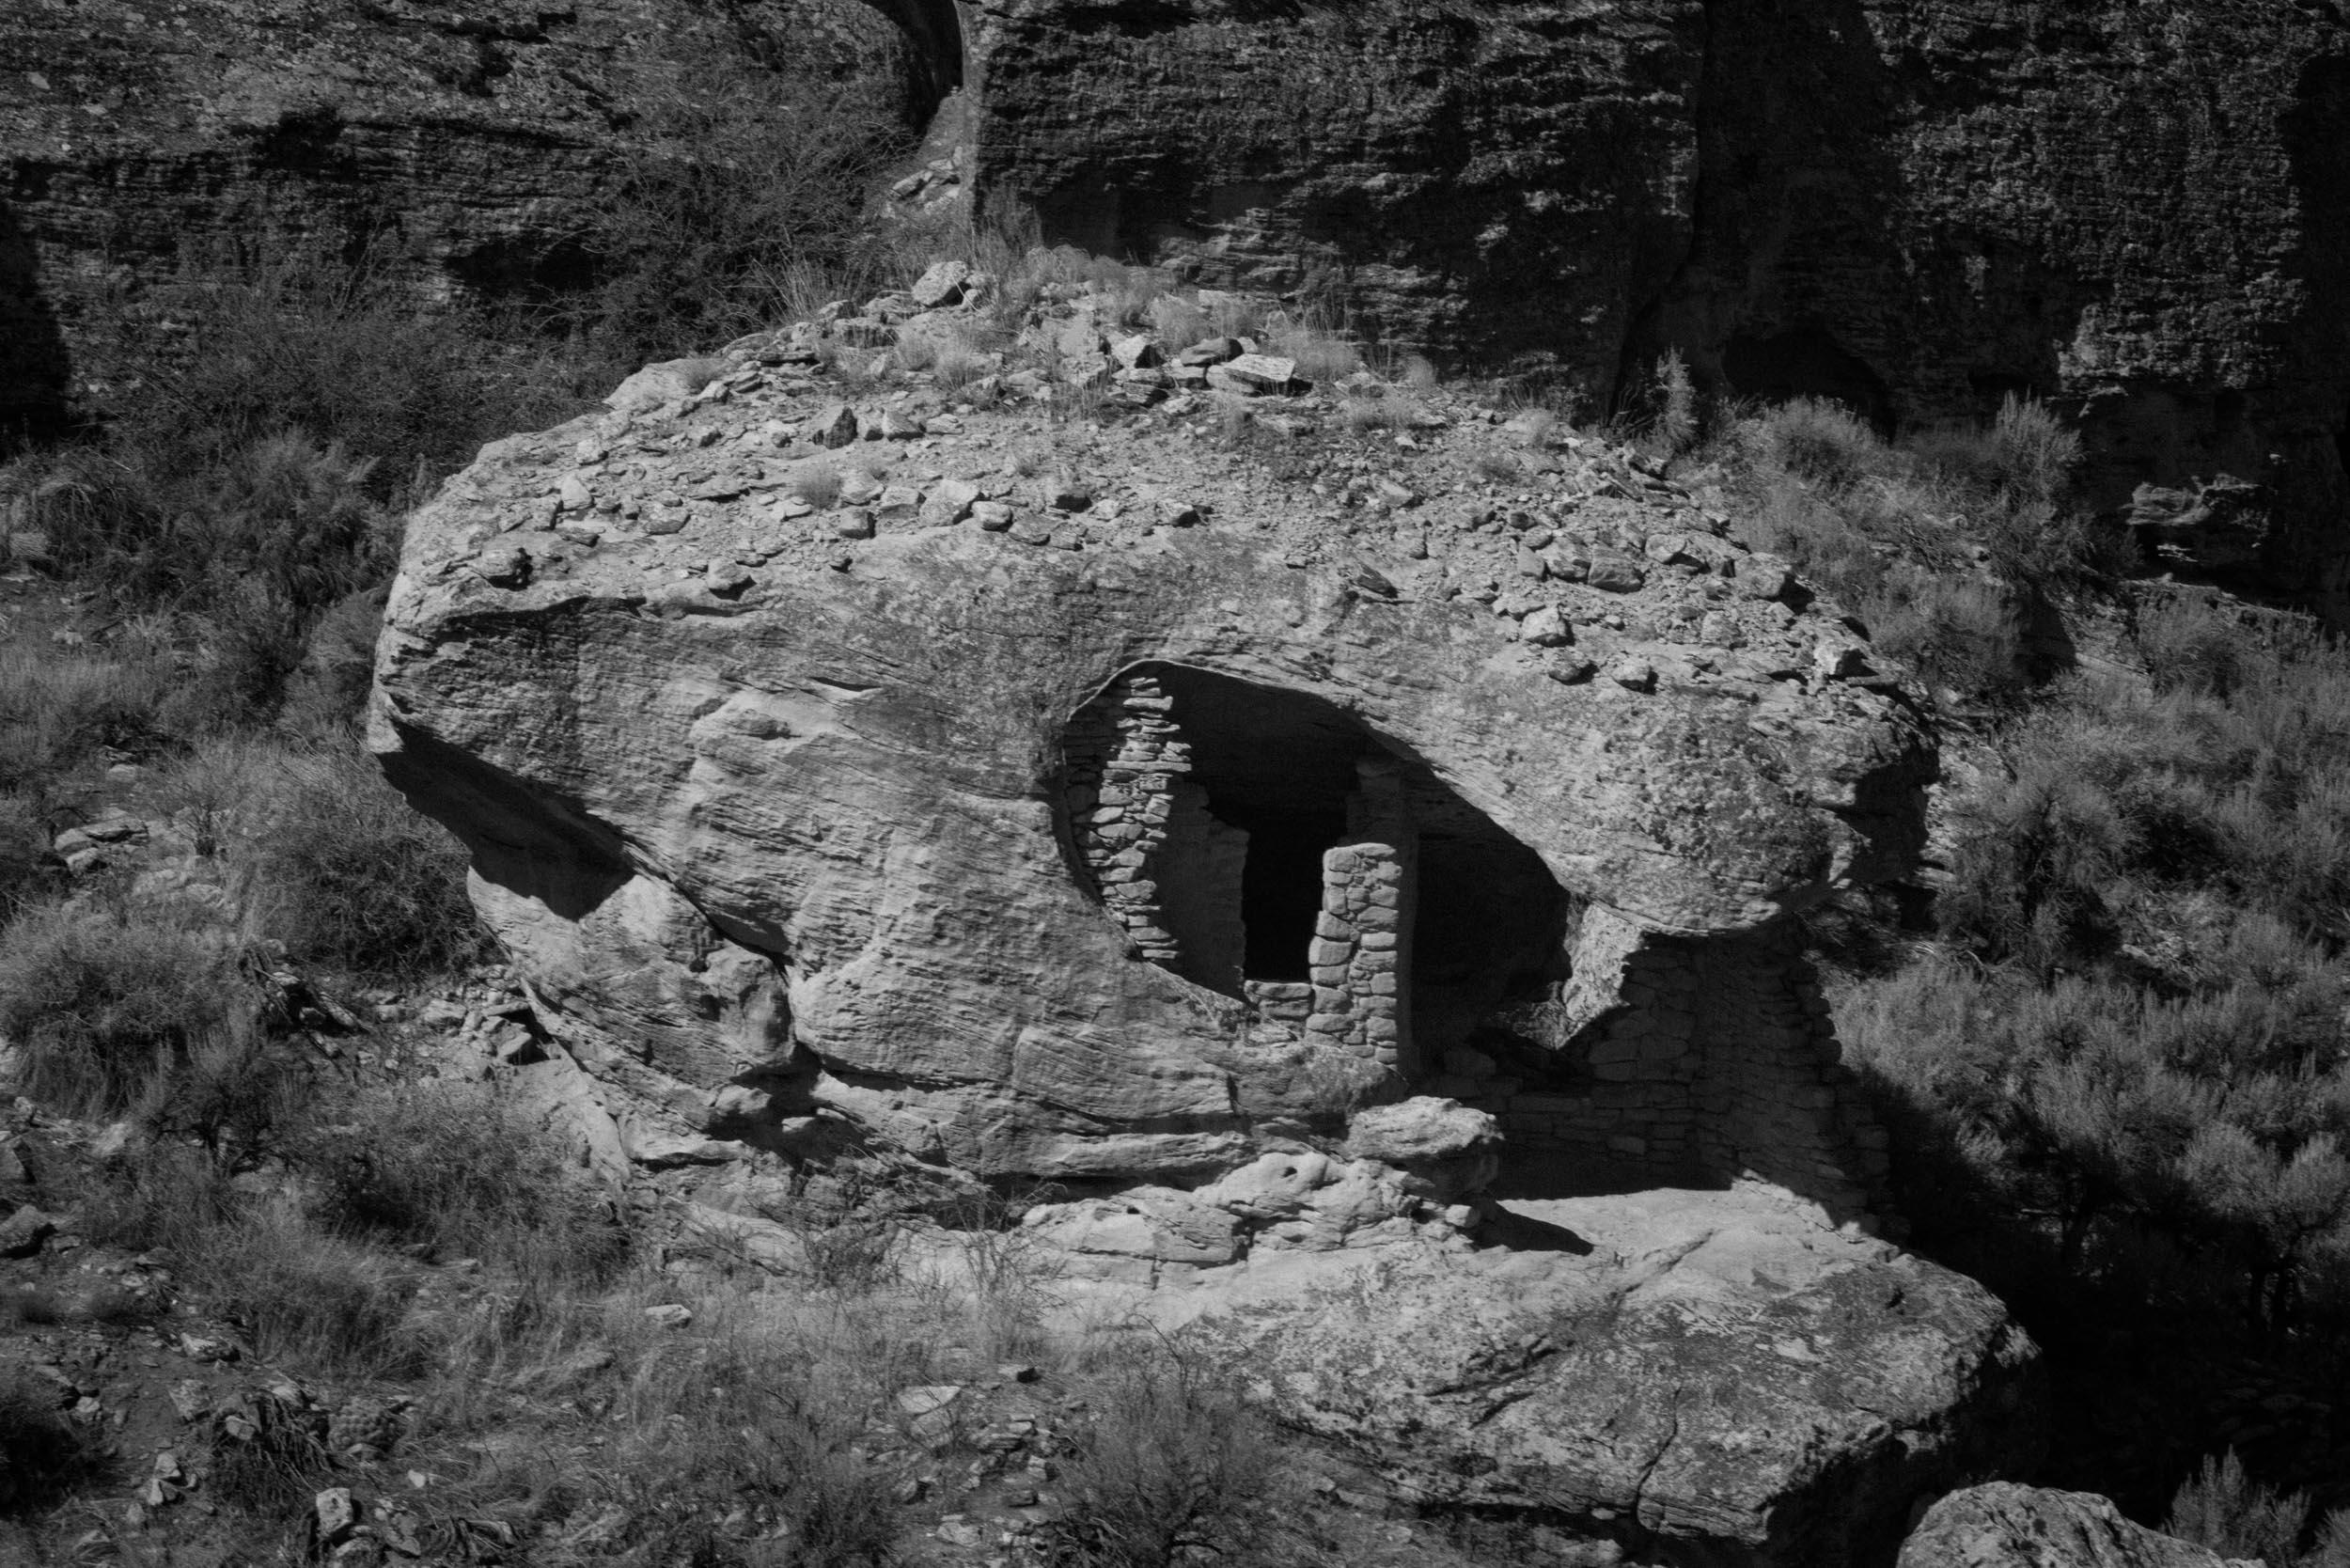 Ancestral Puebloan site at Hovenweep National Park.